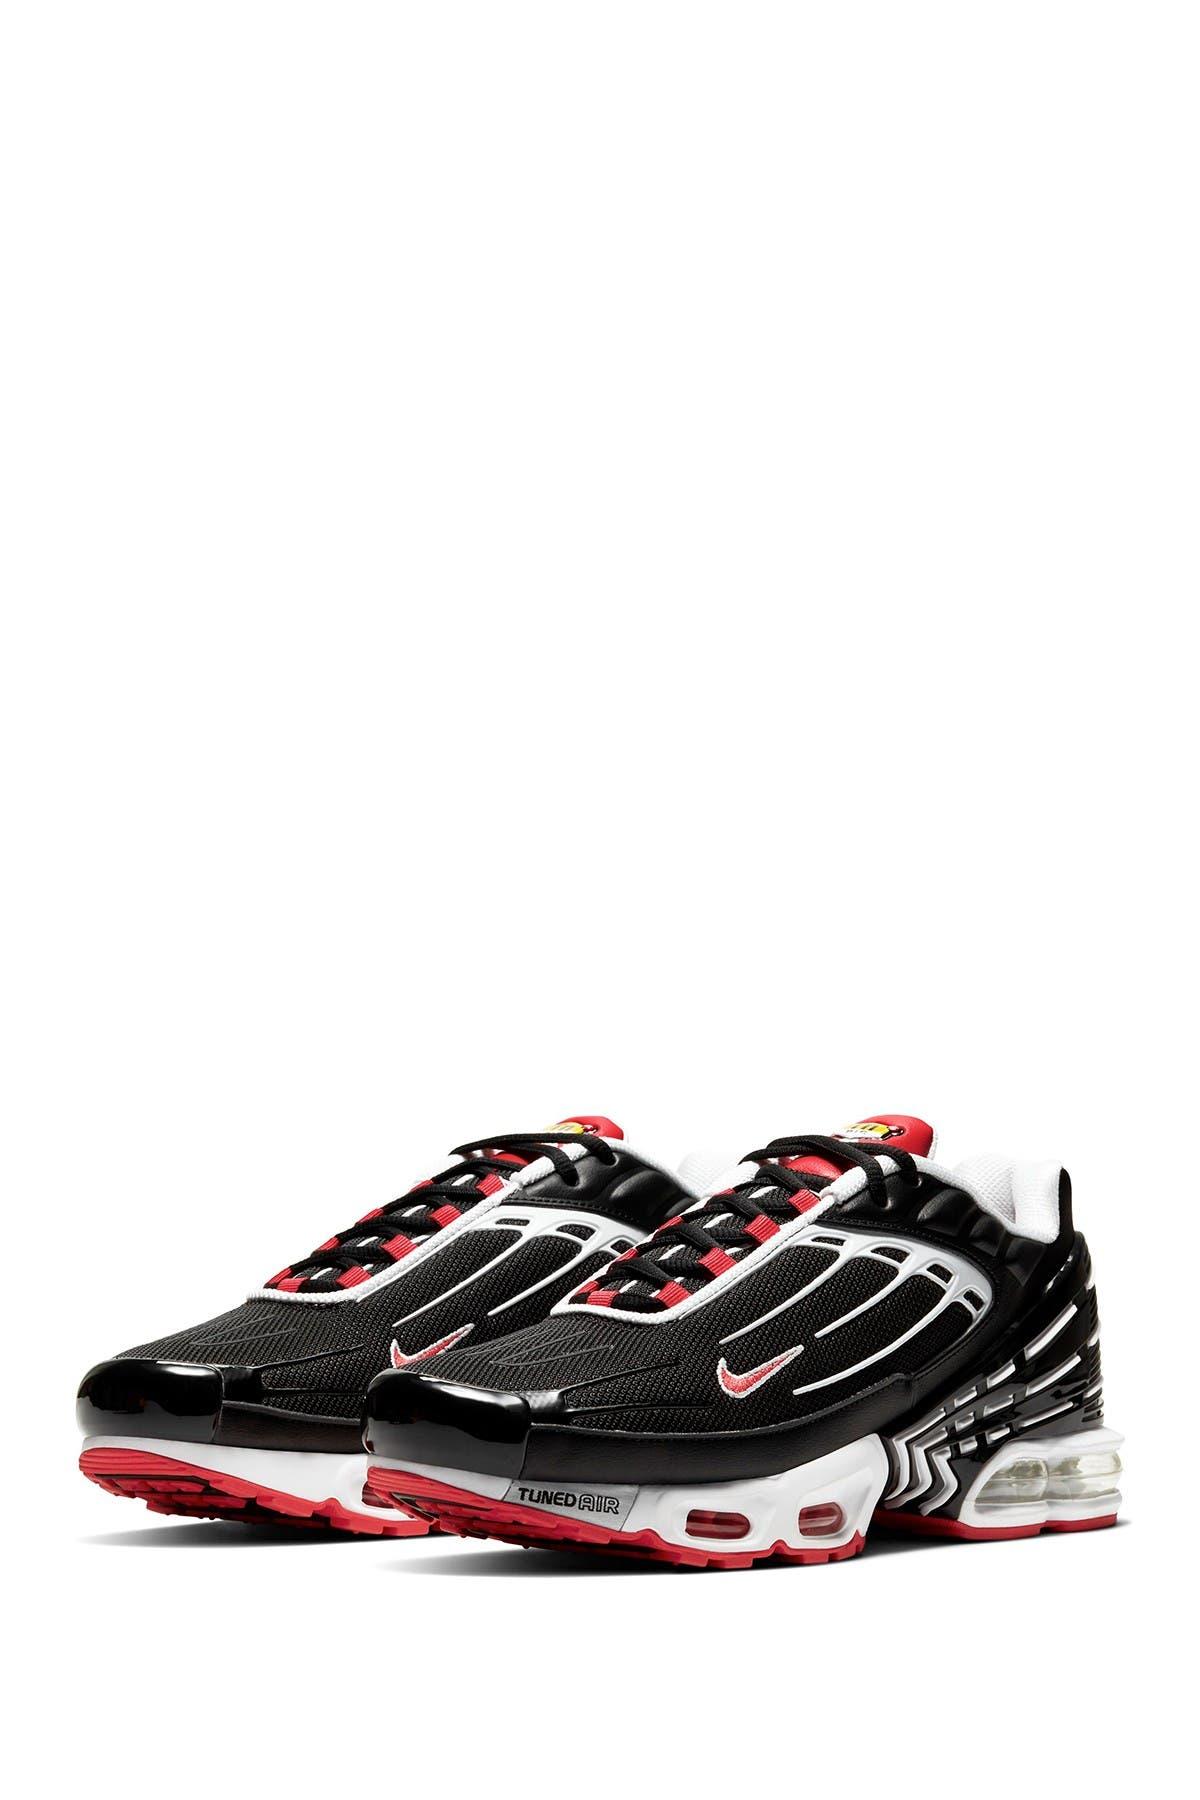 Image of Nike Air Max Plus III Sneaker